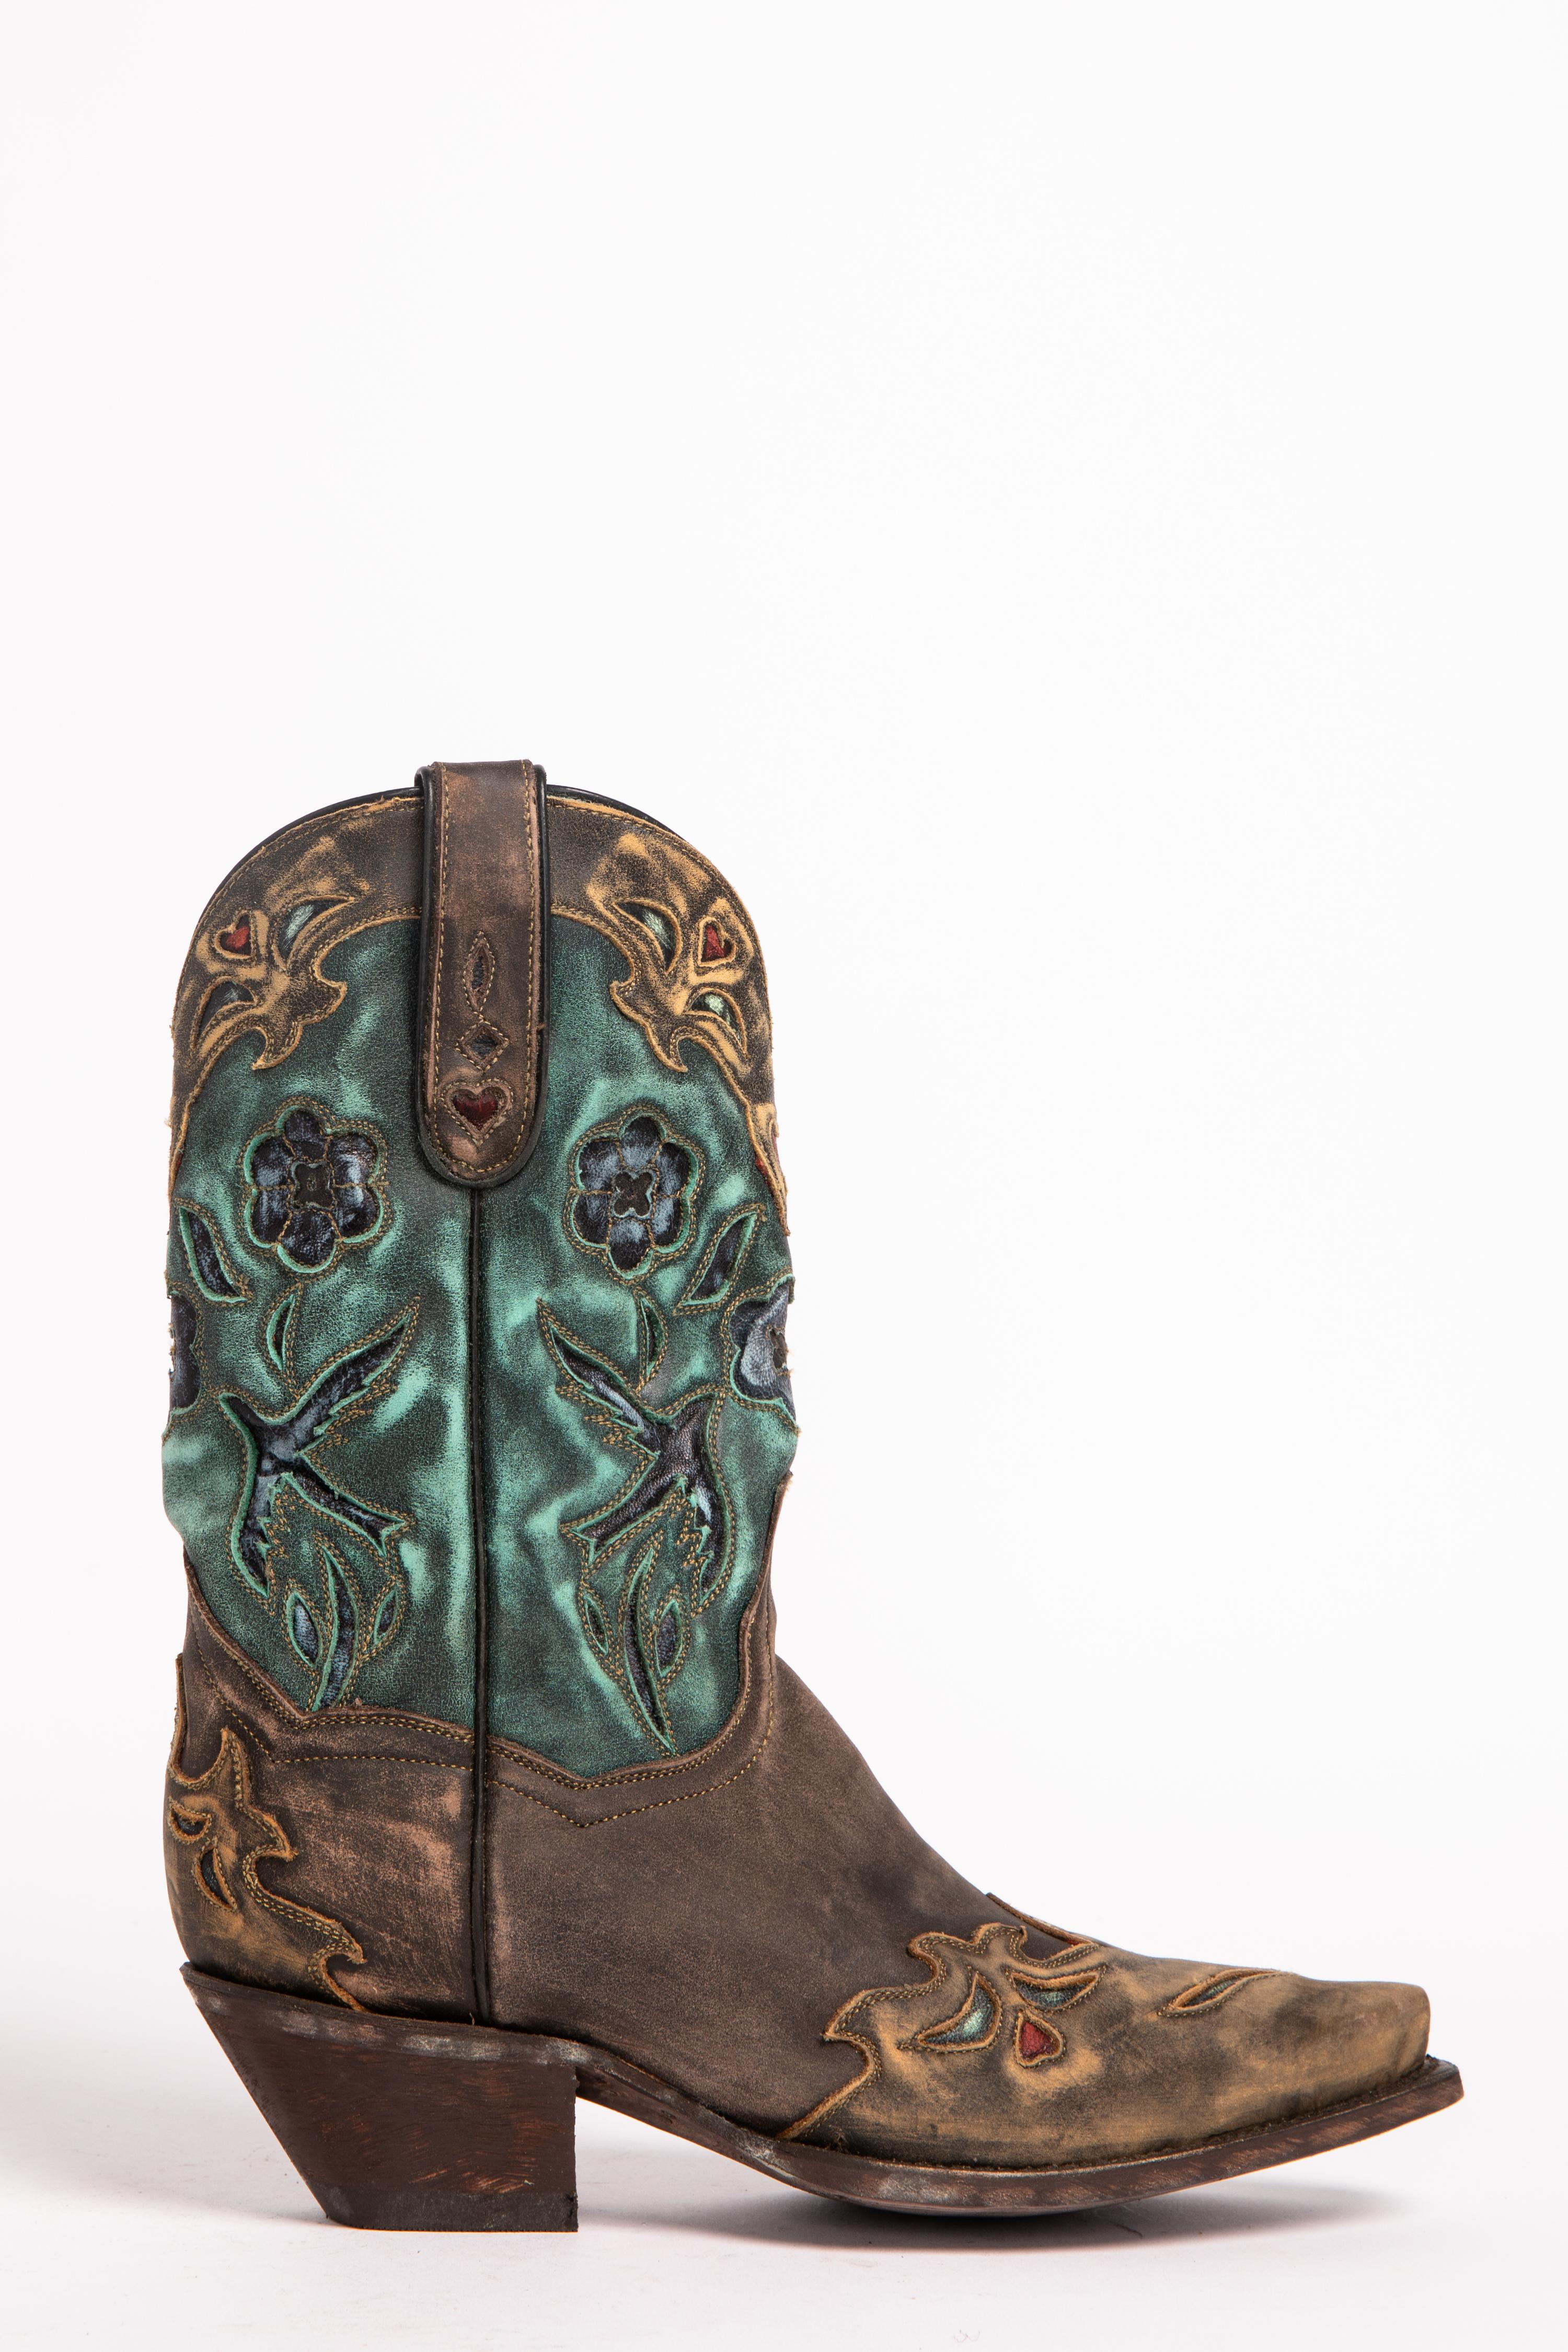 Dan Post Blue Bird Wingtip Cowgirl Boots Snip Toe Sheplers